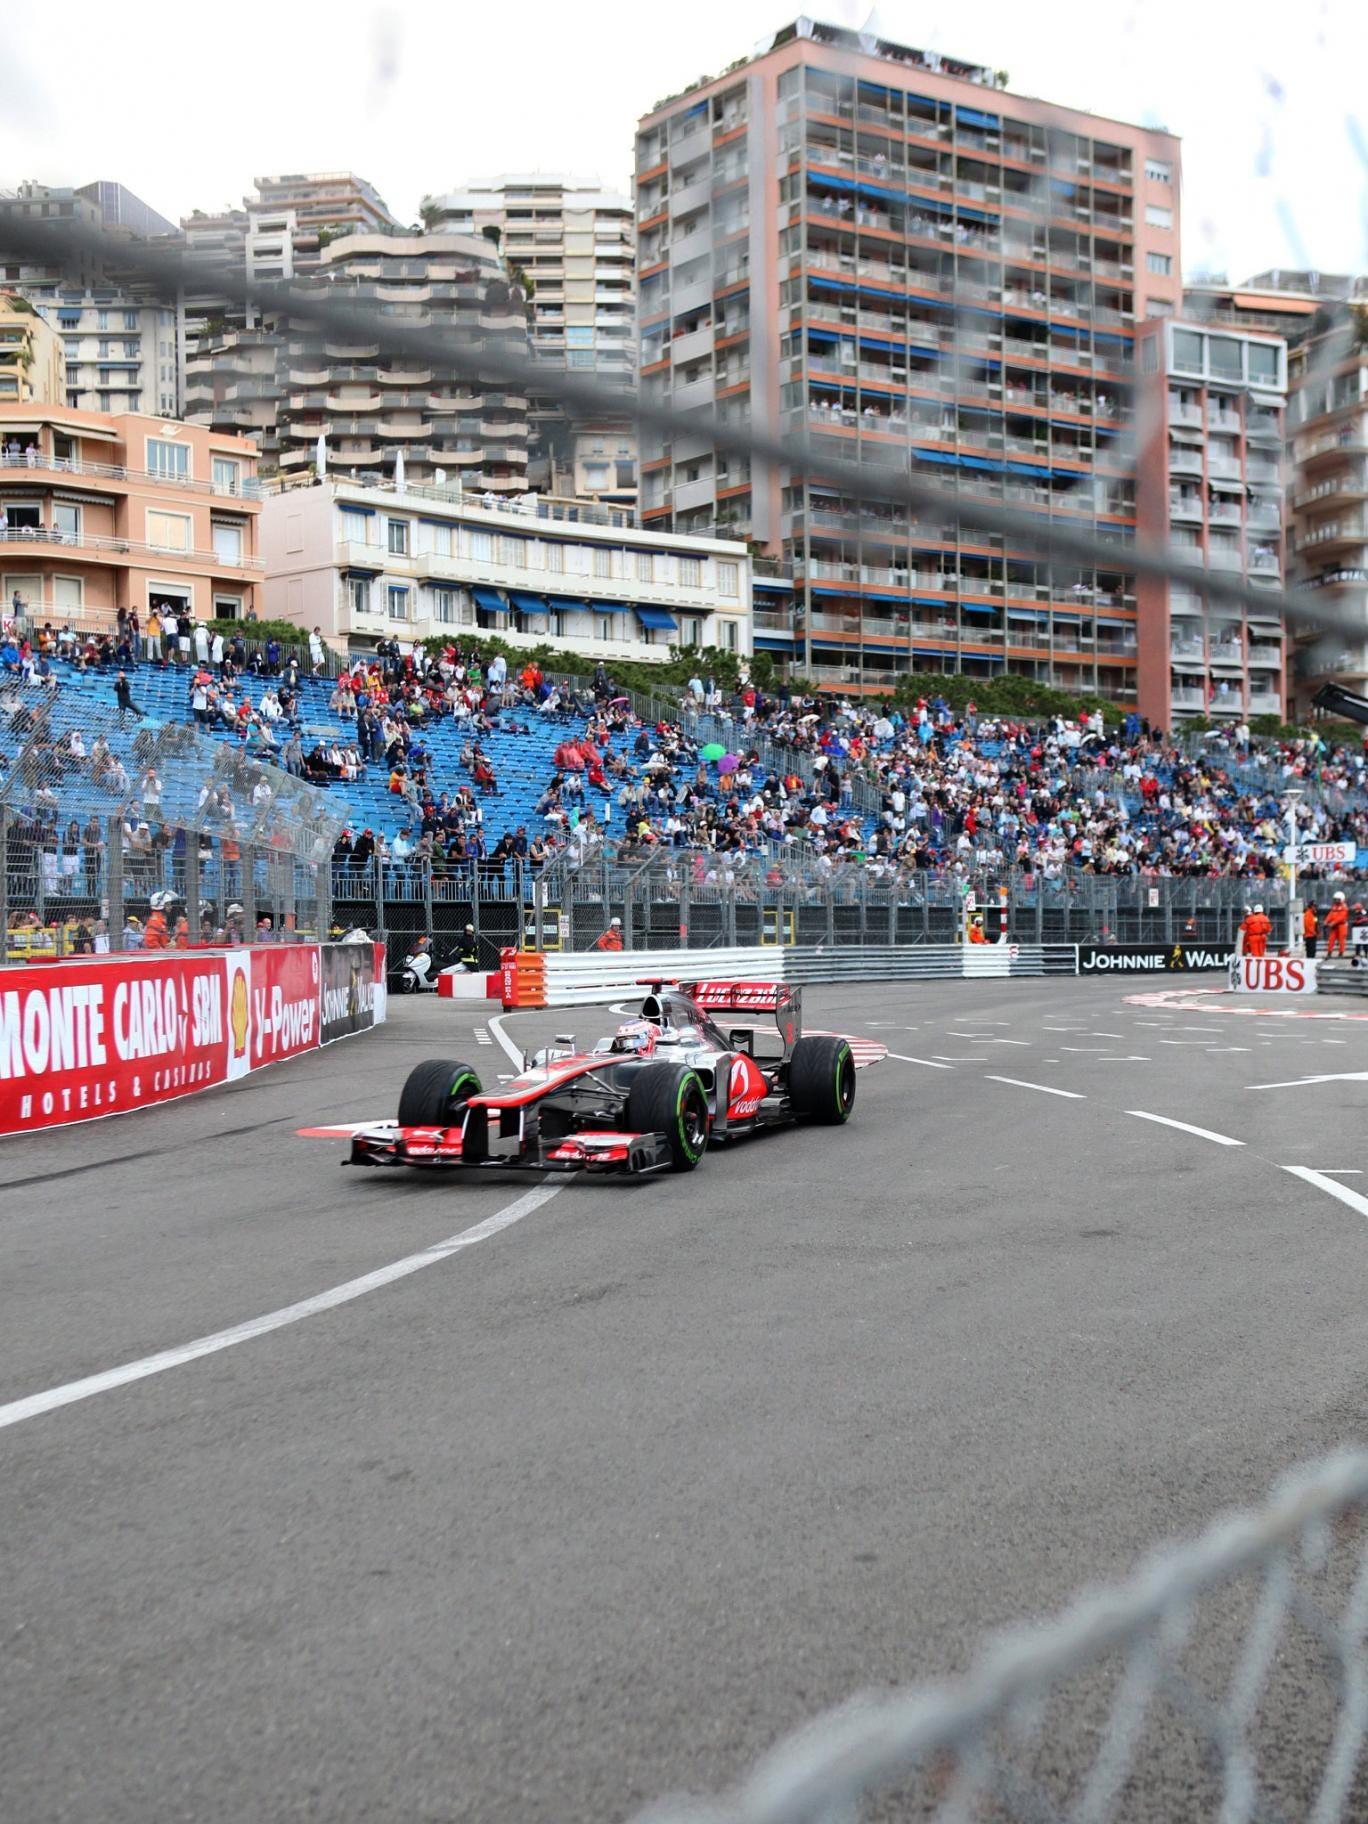 Jenson Button at Monaco 2012, when he failed to finish